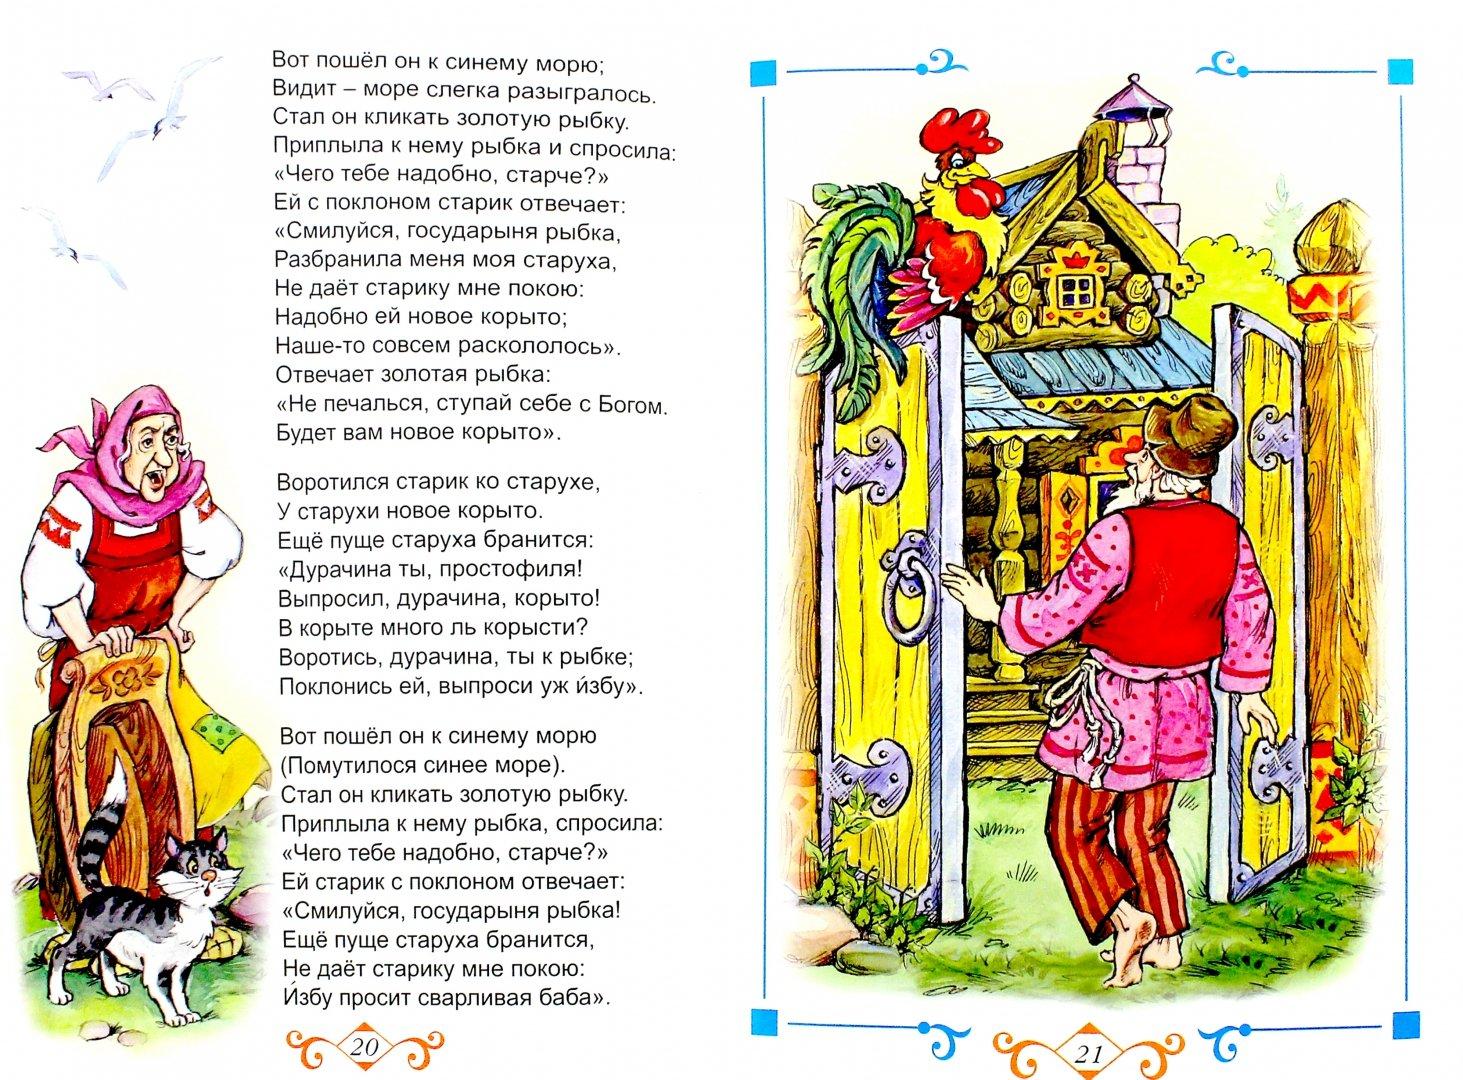 Иллюстрация 1 из 5 для Сказки - Александр Пушкин | Лабиринт - книги. Источник: Лабиринт